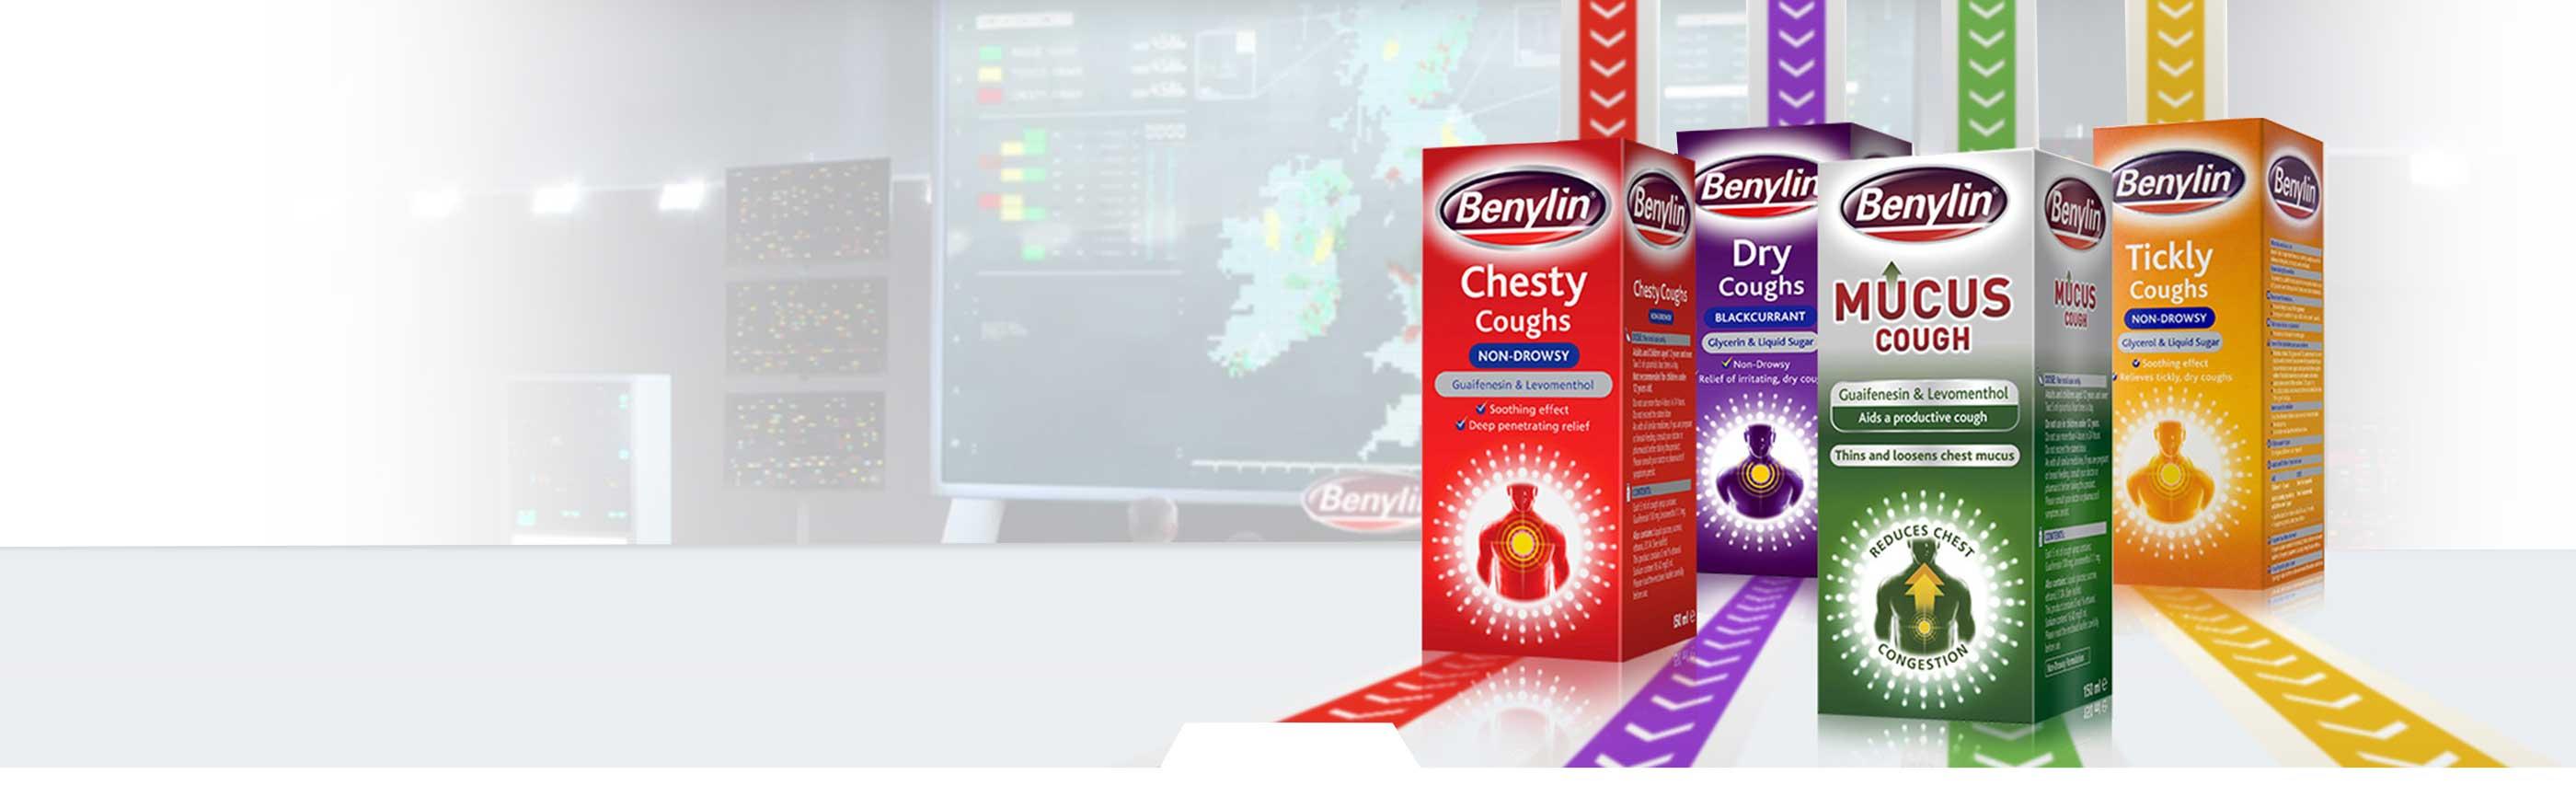 BENYLIN® Cough Product Range